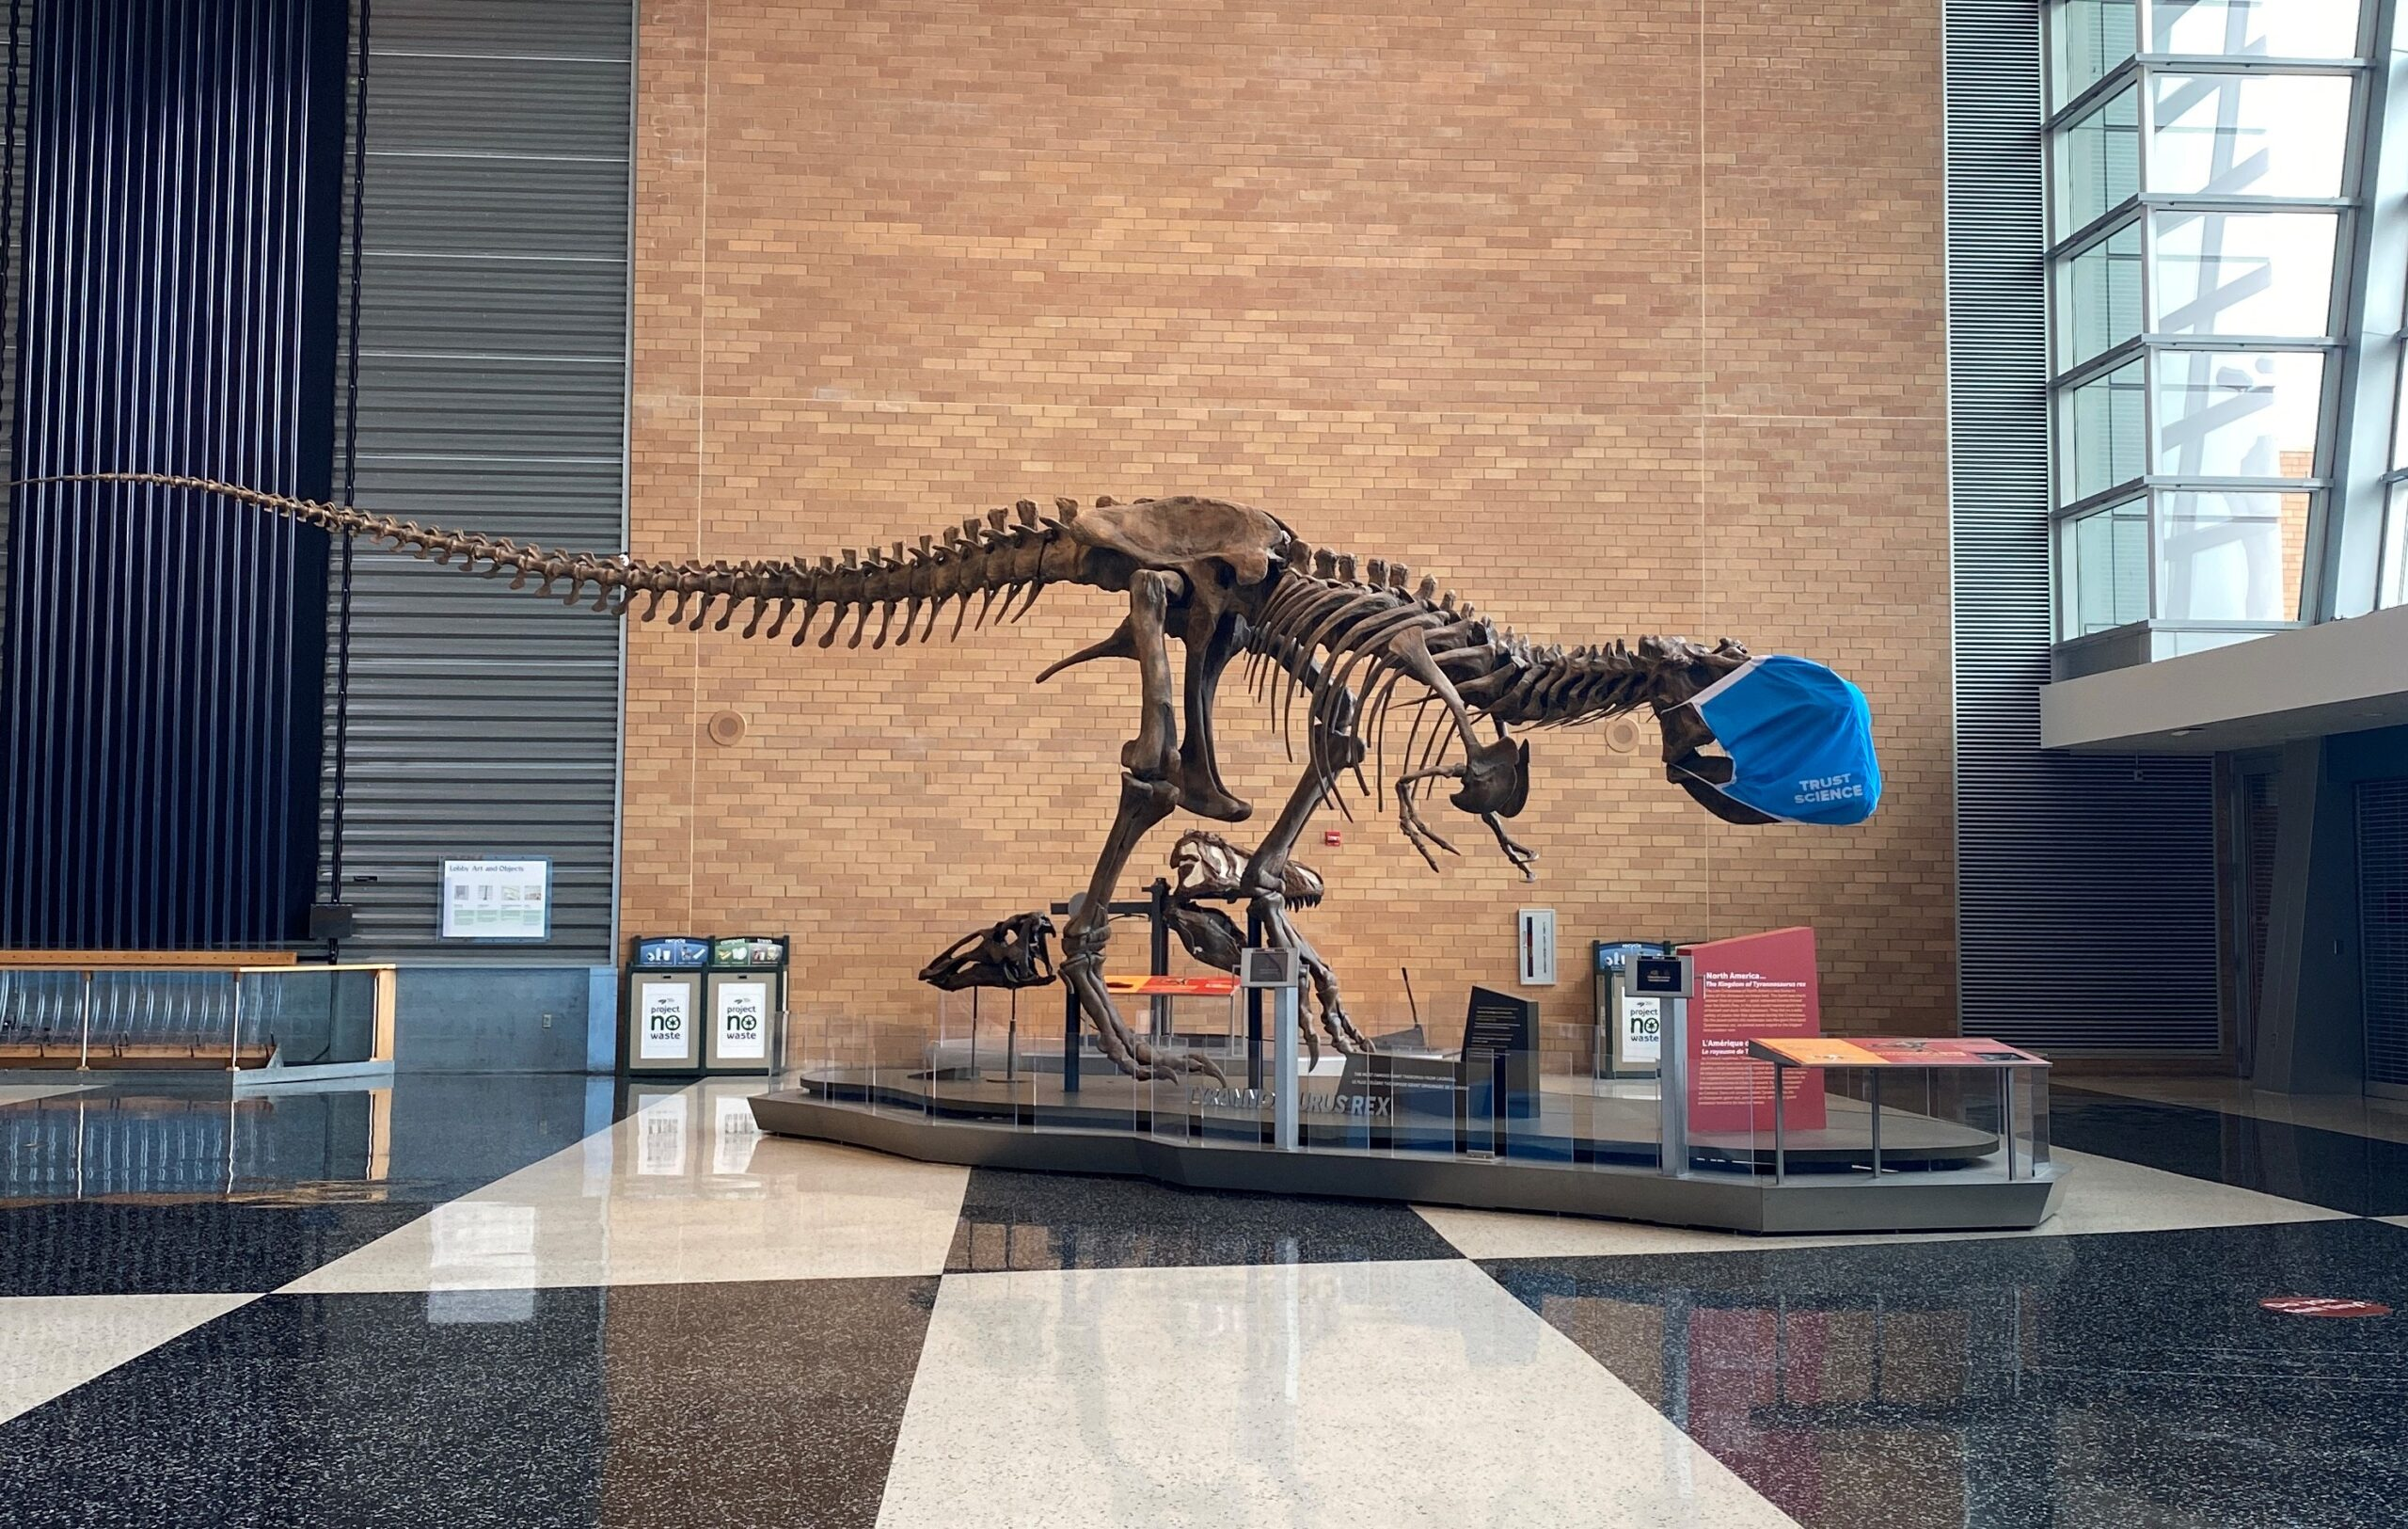 The Science Museum's T. rex specimen demonstrating proper masking.